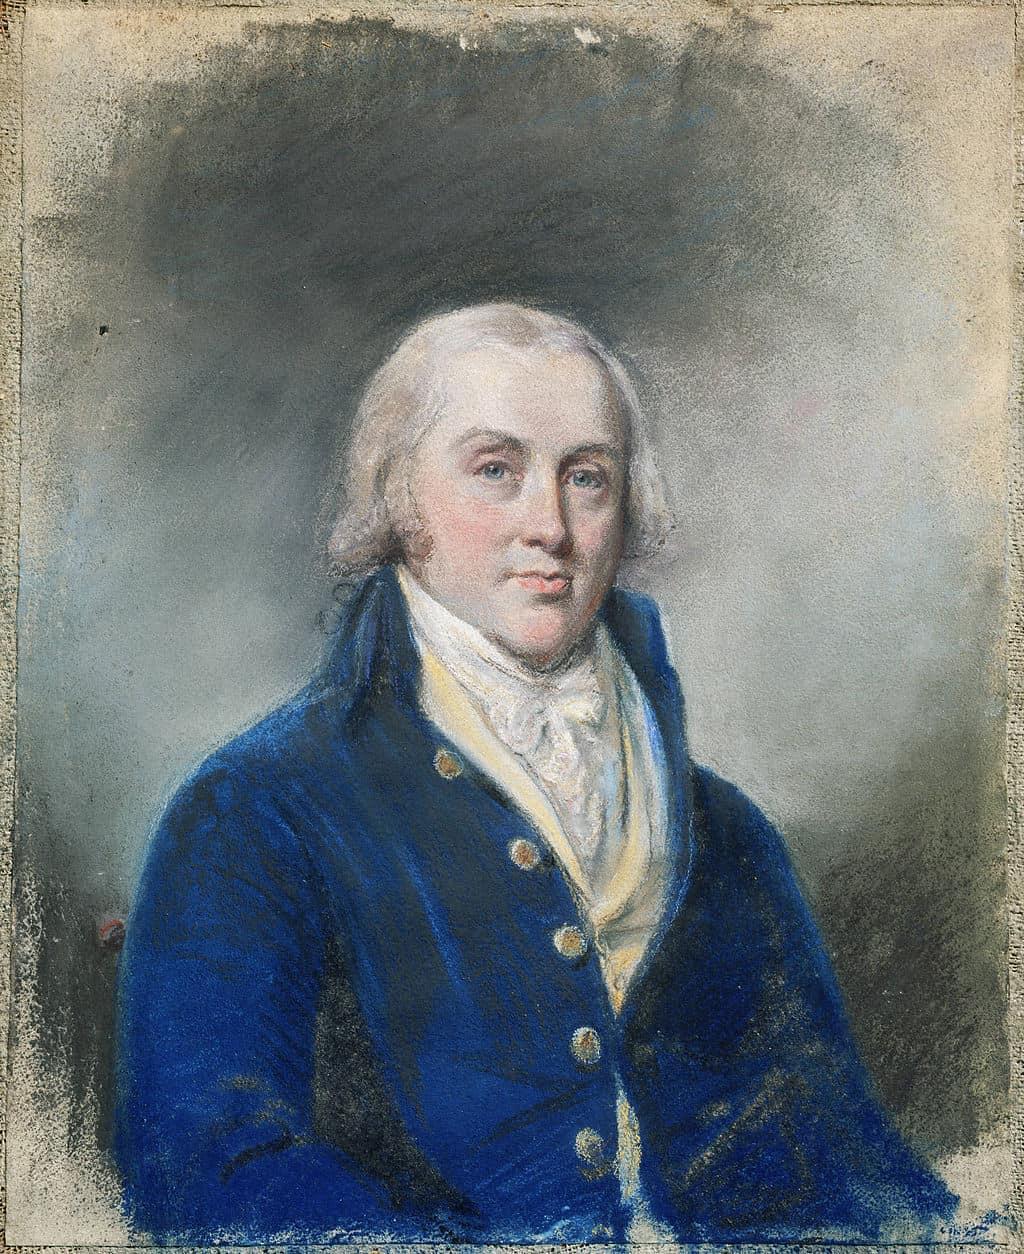 1811,_Sharples,_James,_James_Madison